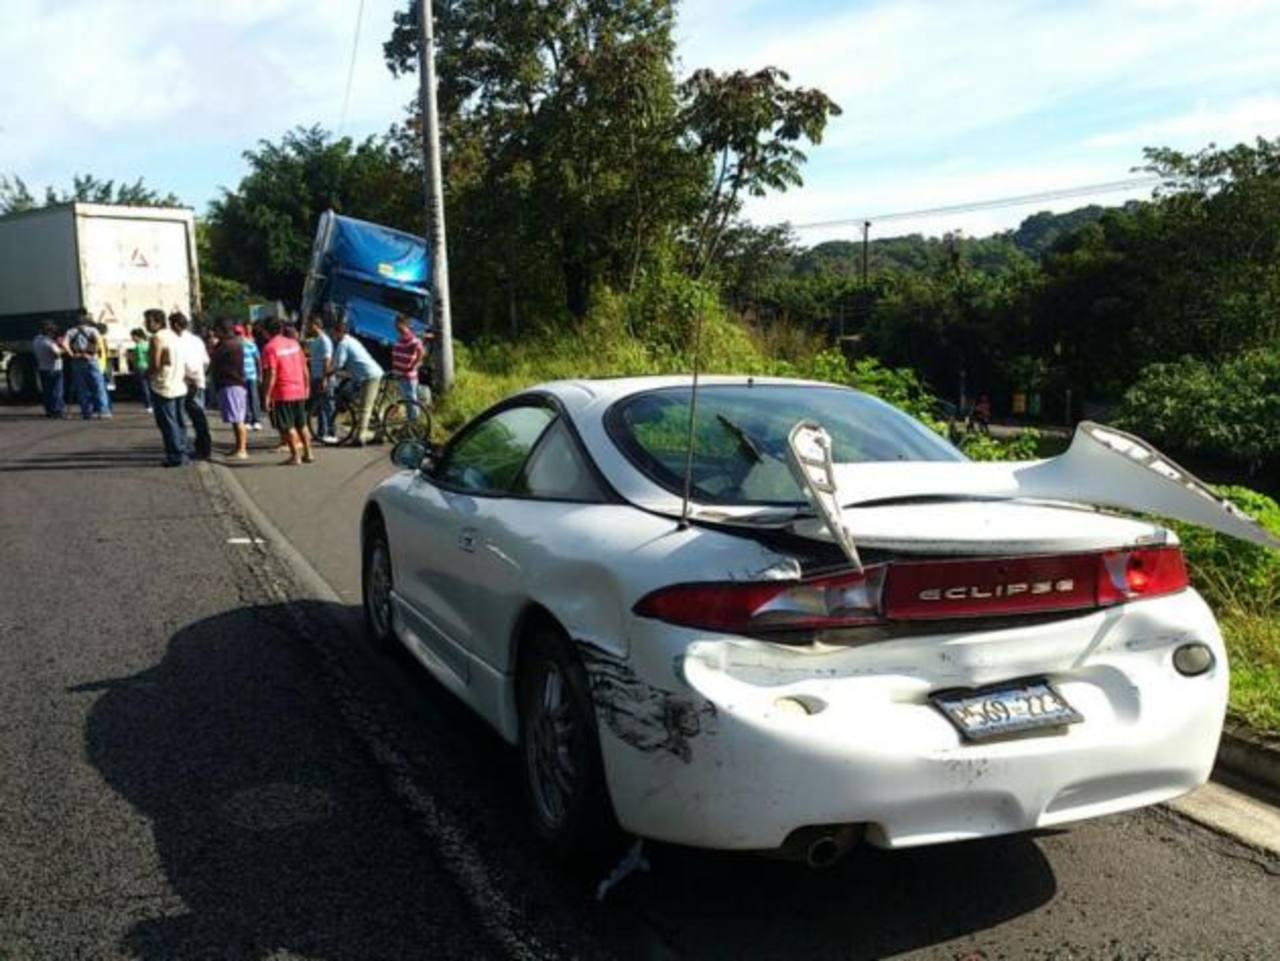 Lugar del accidente múltiple. Foto EDH Claudia Castillo